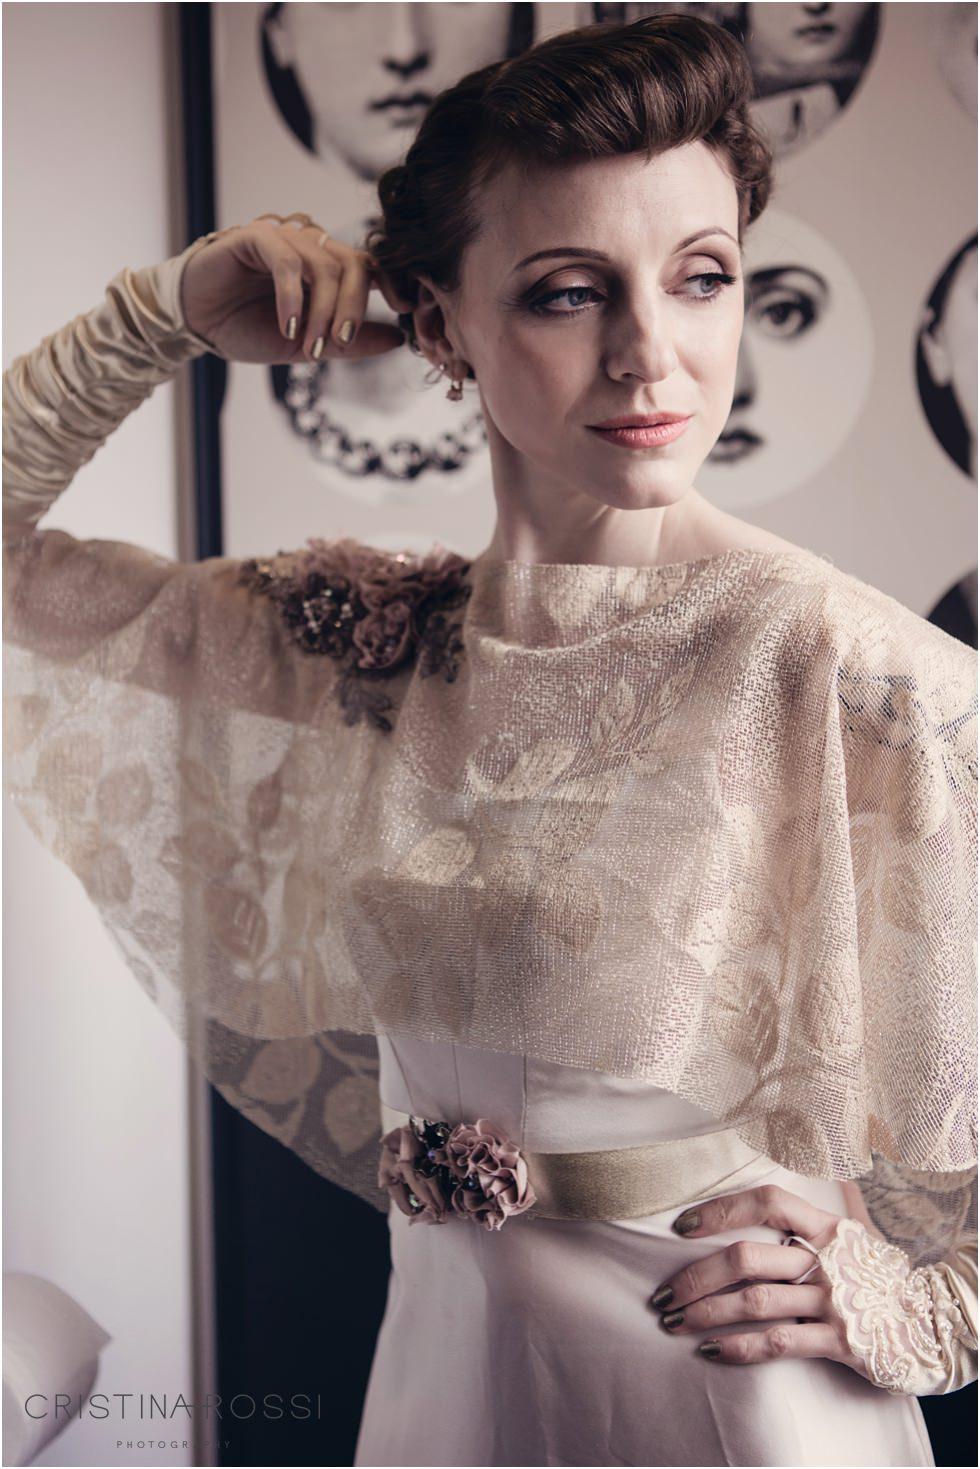 Cristina Rossi Photography_0357